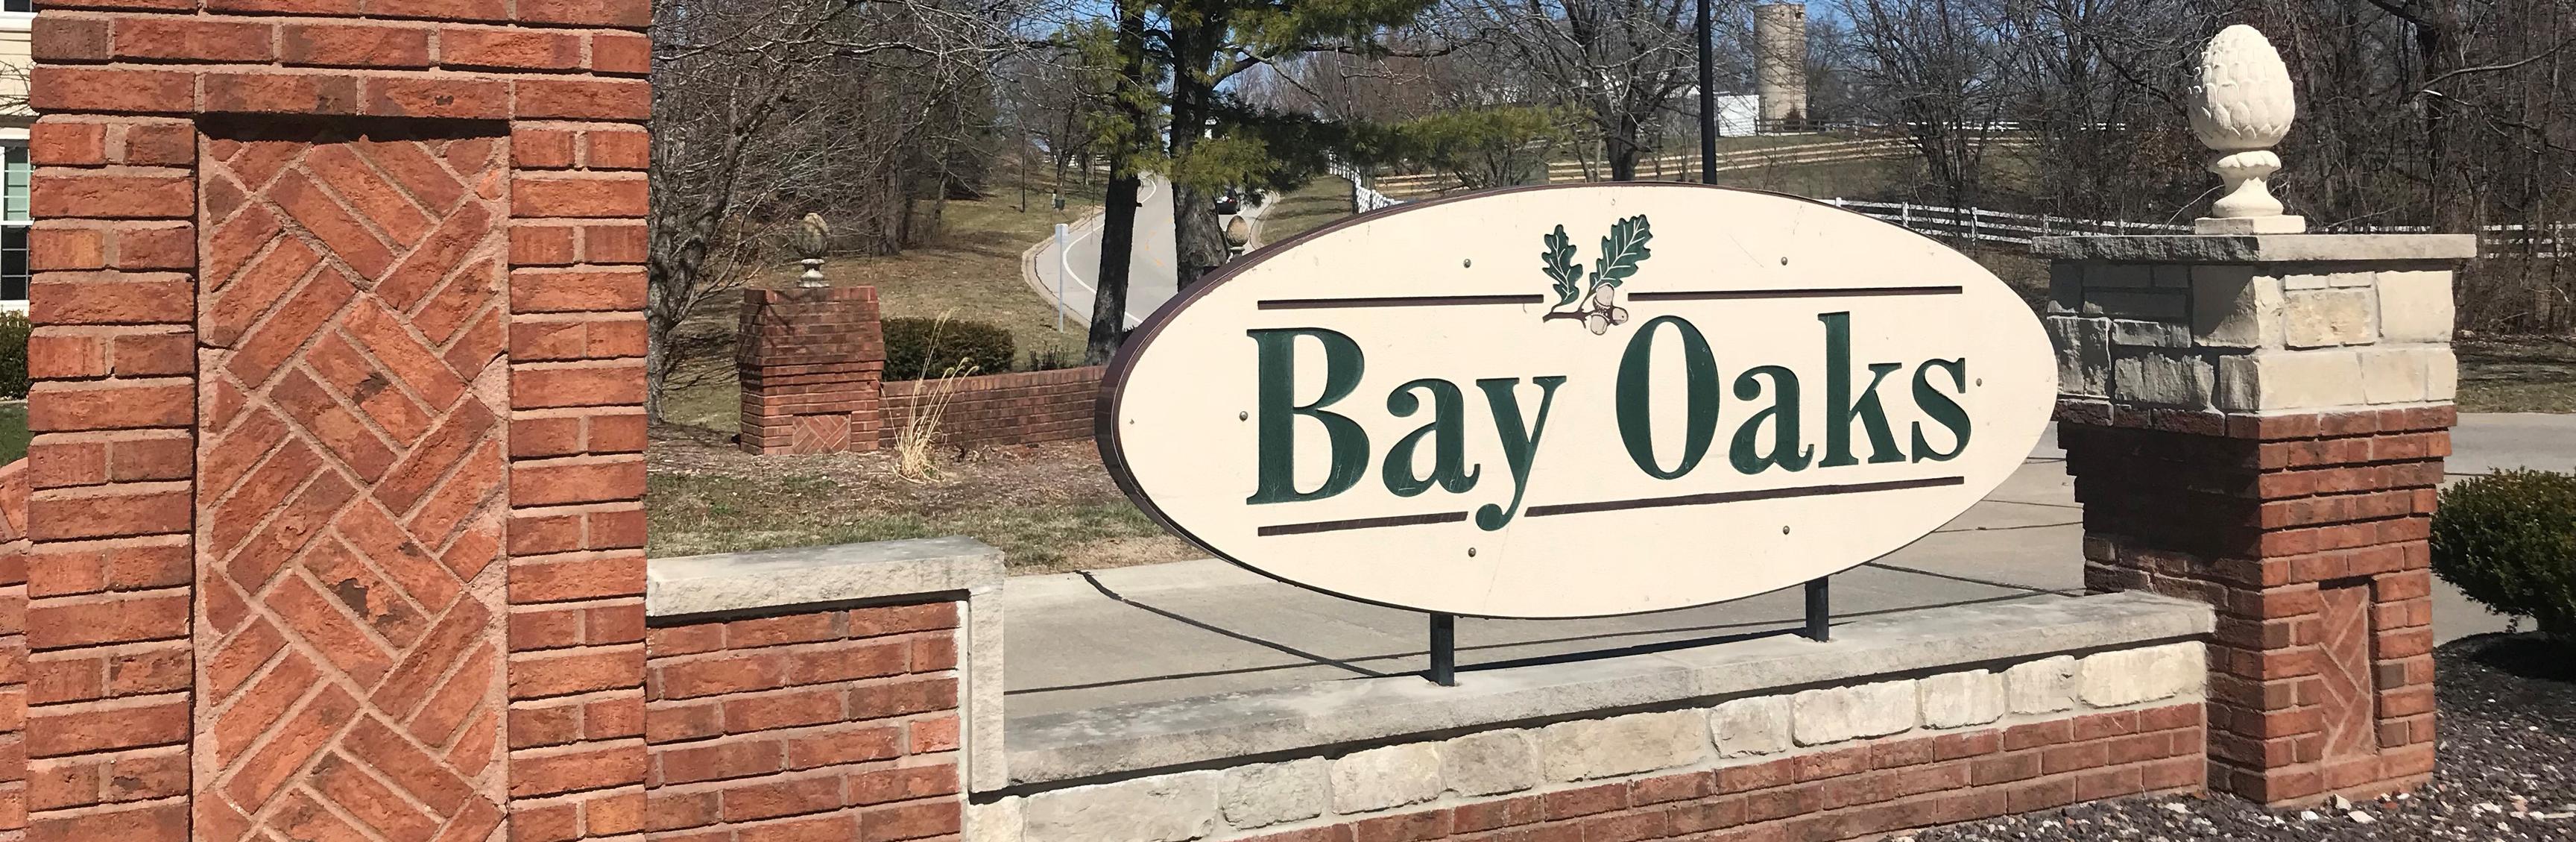 Bay Oaks Subdivision, Lake St. Louis, MO